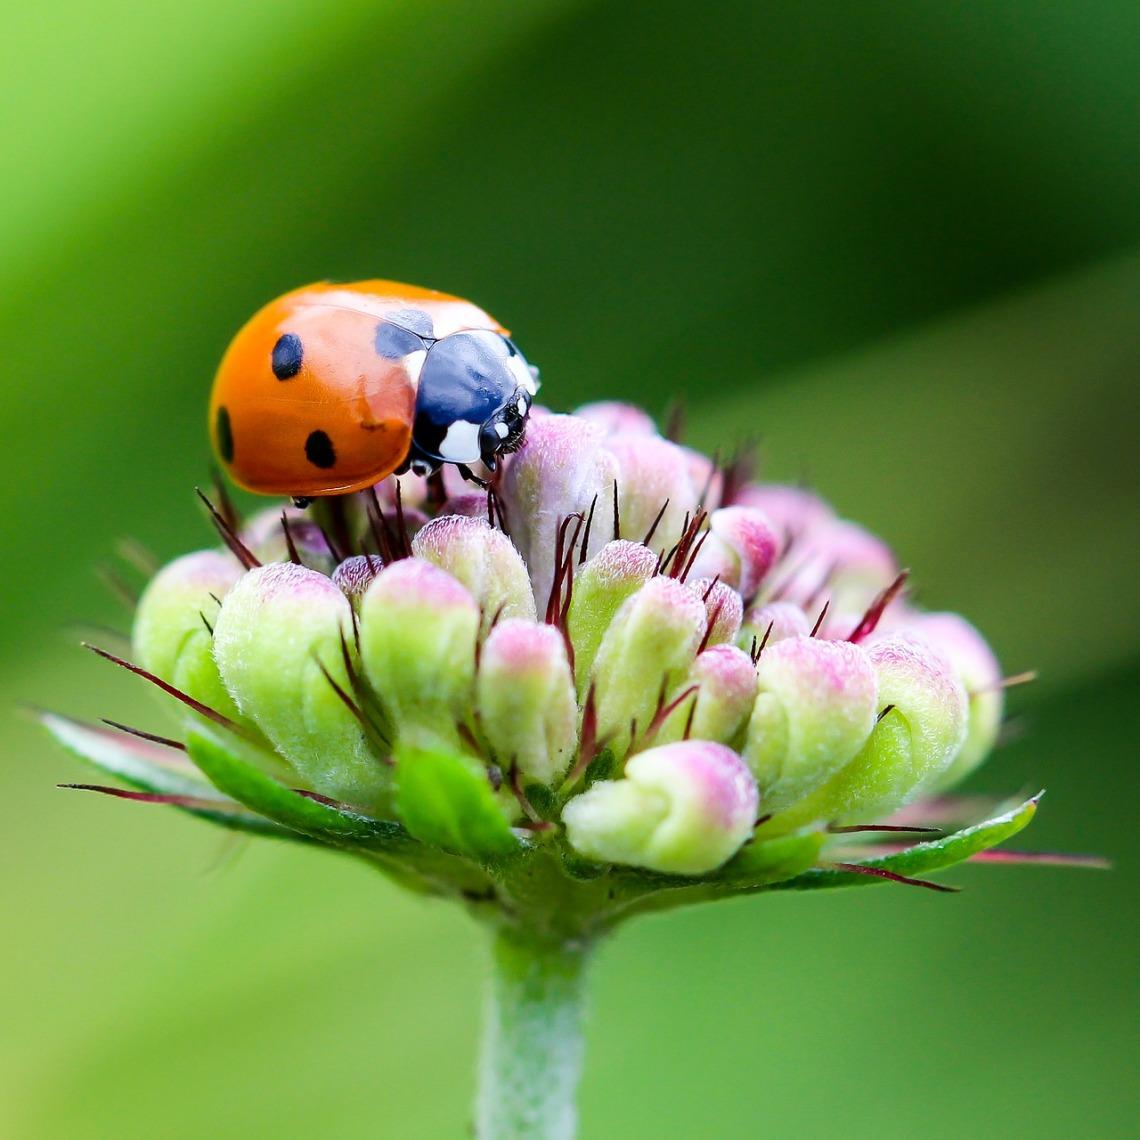 haiku about ladybug